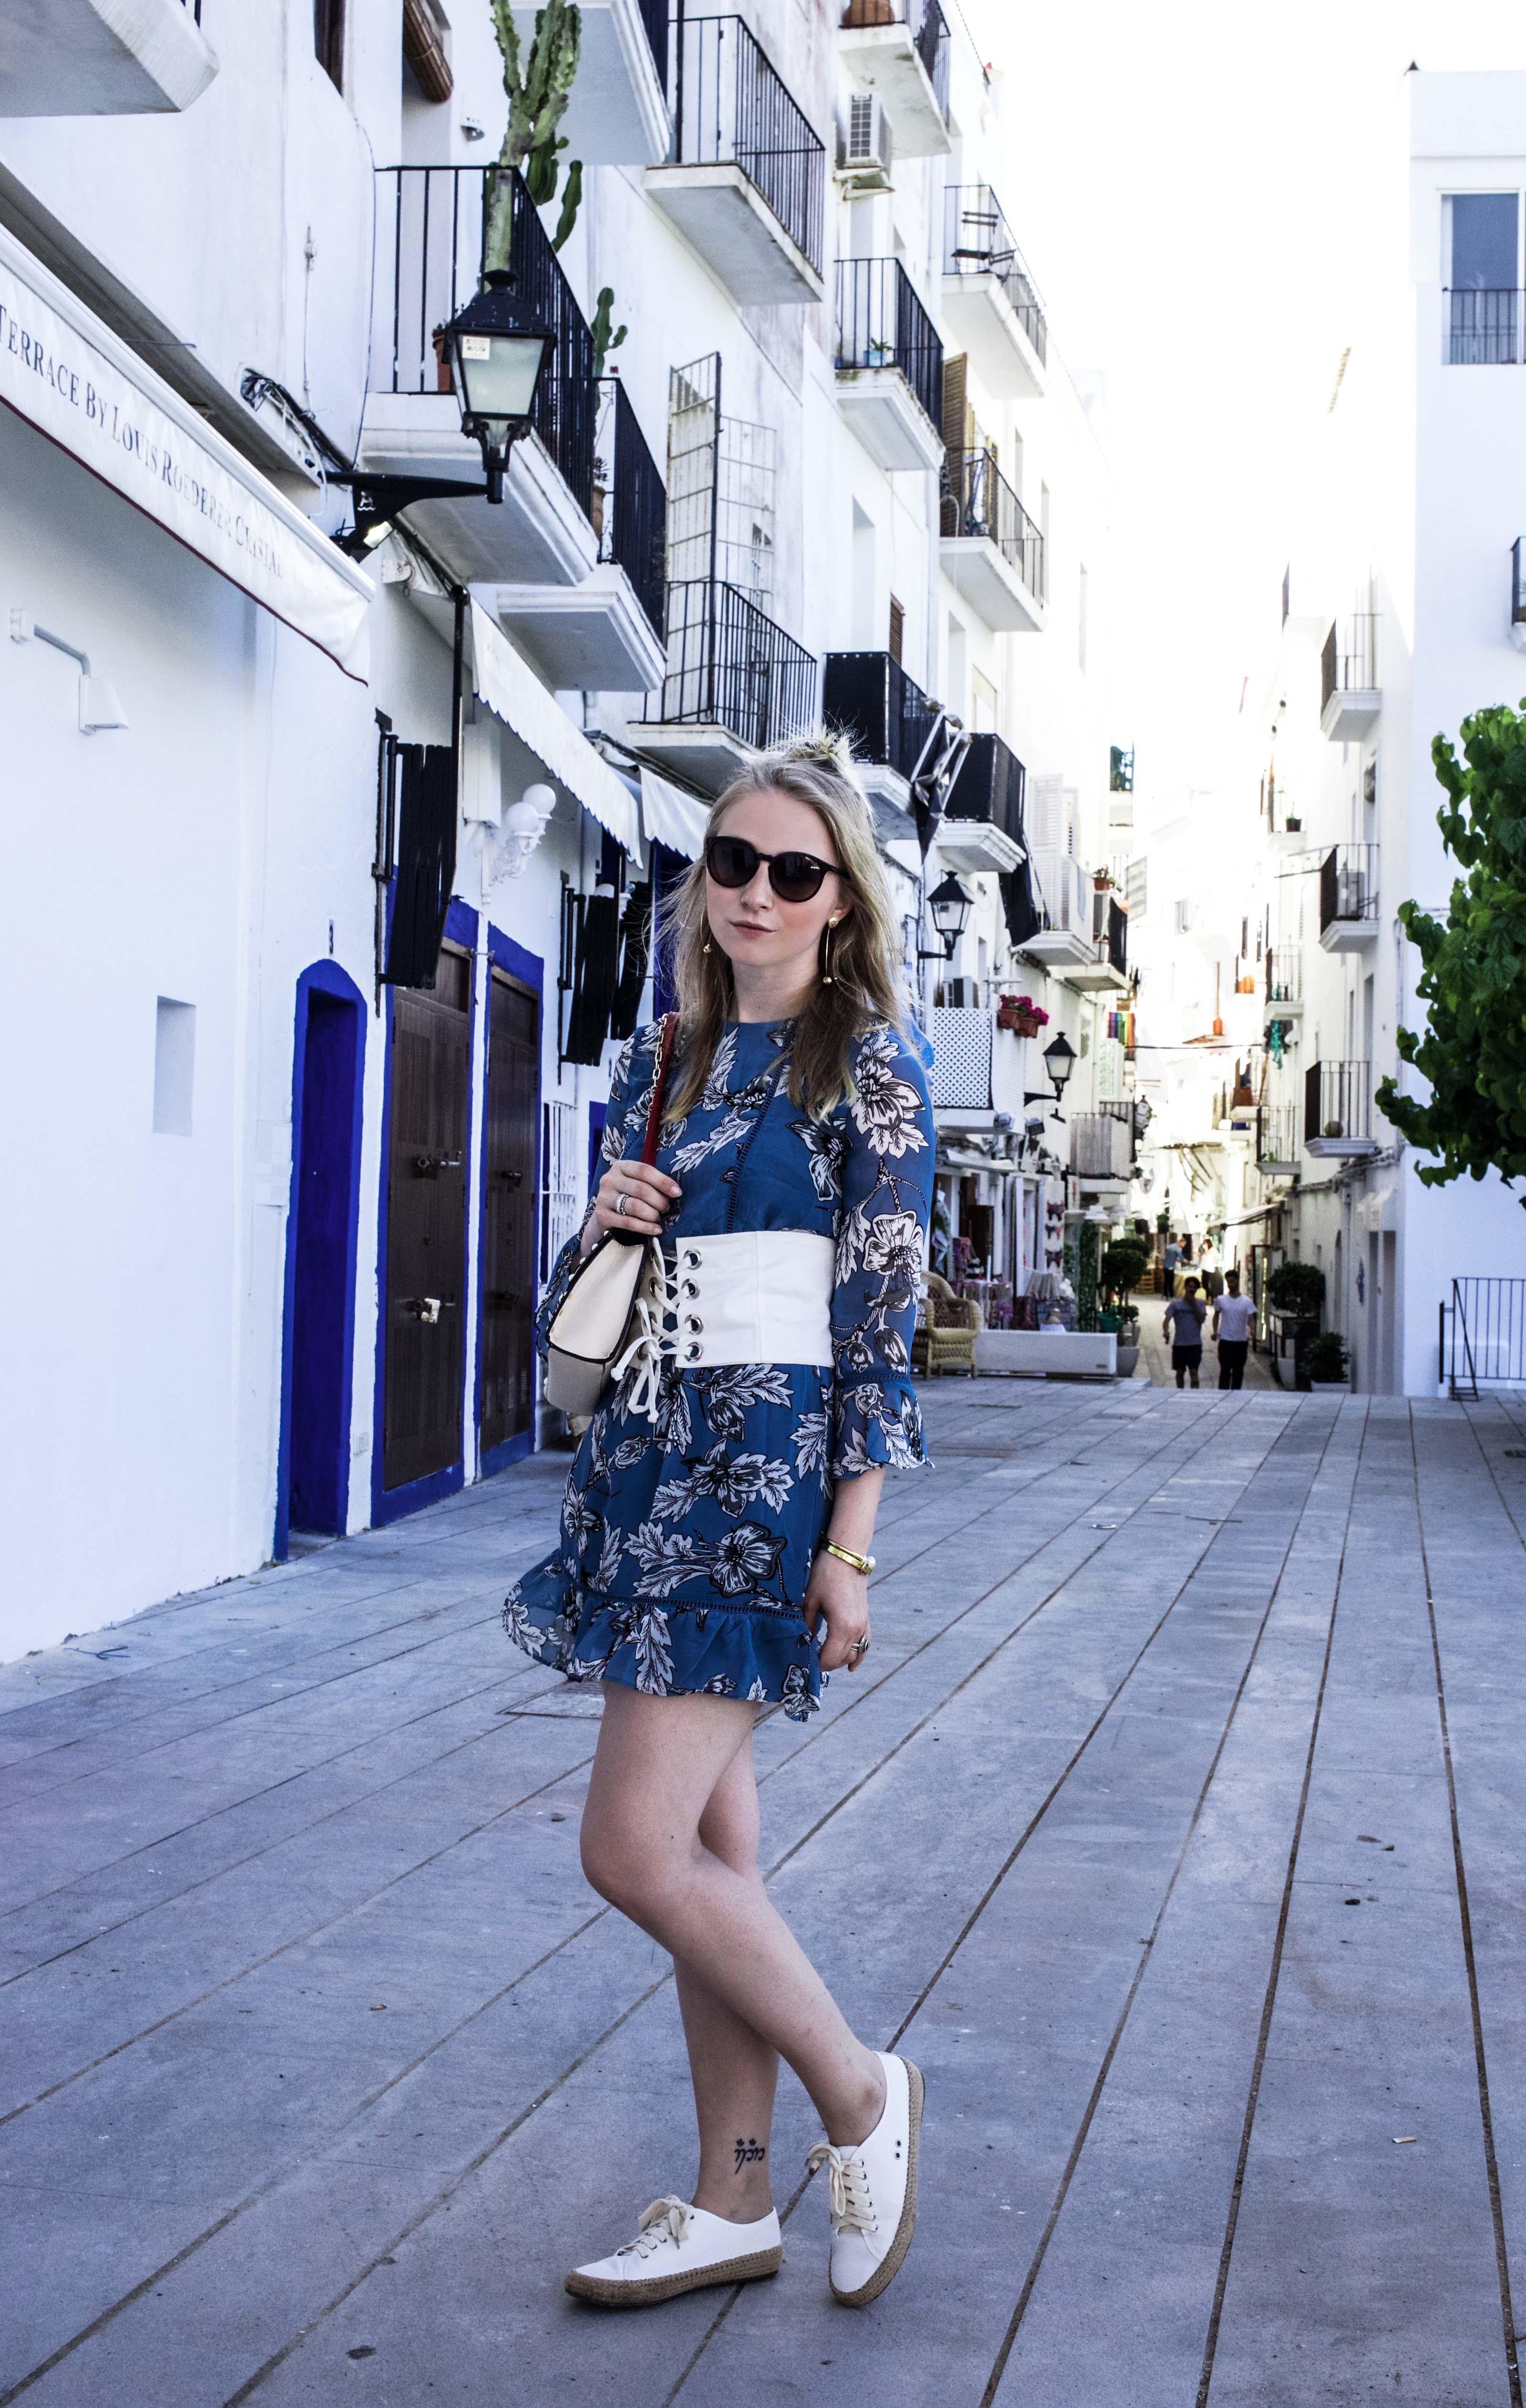 trend-report-taillengürtel-espadrilles-sommerlook-ibiza-modeblog-fashionblog-fashionvernissage_9513